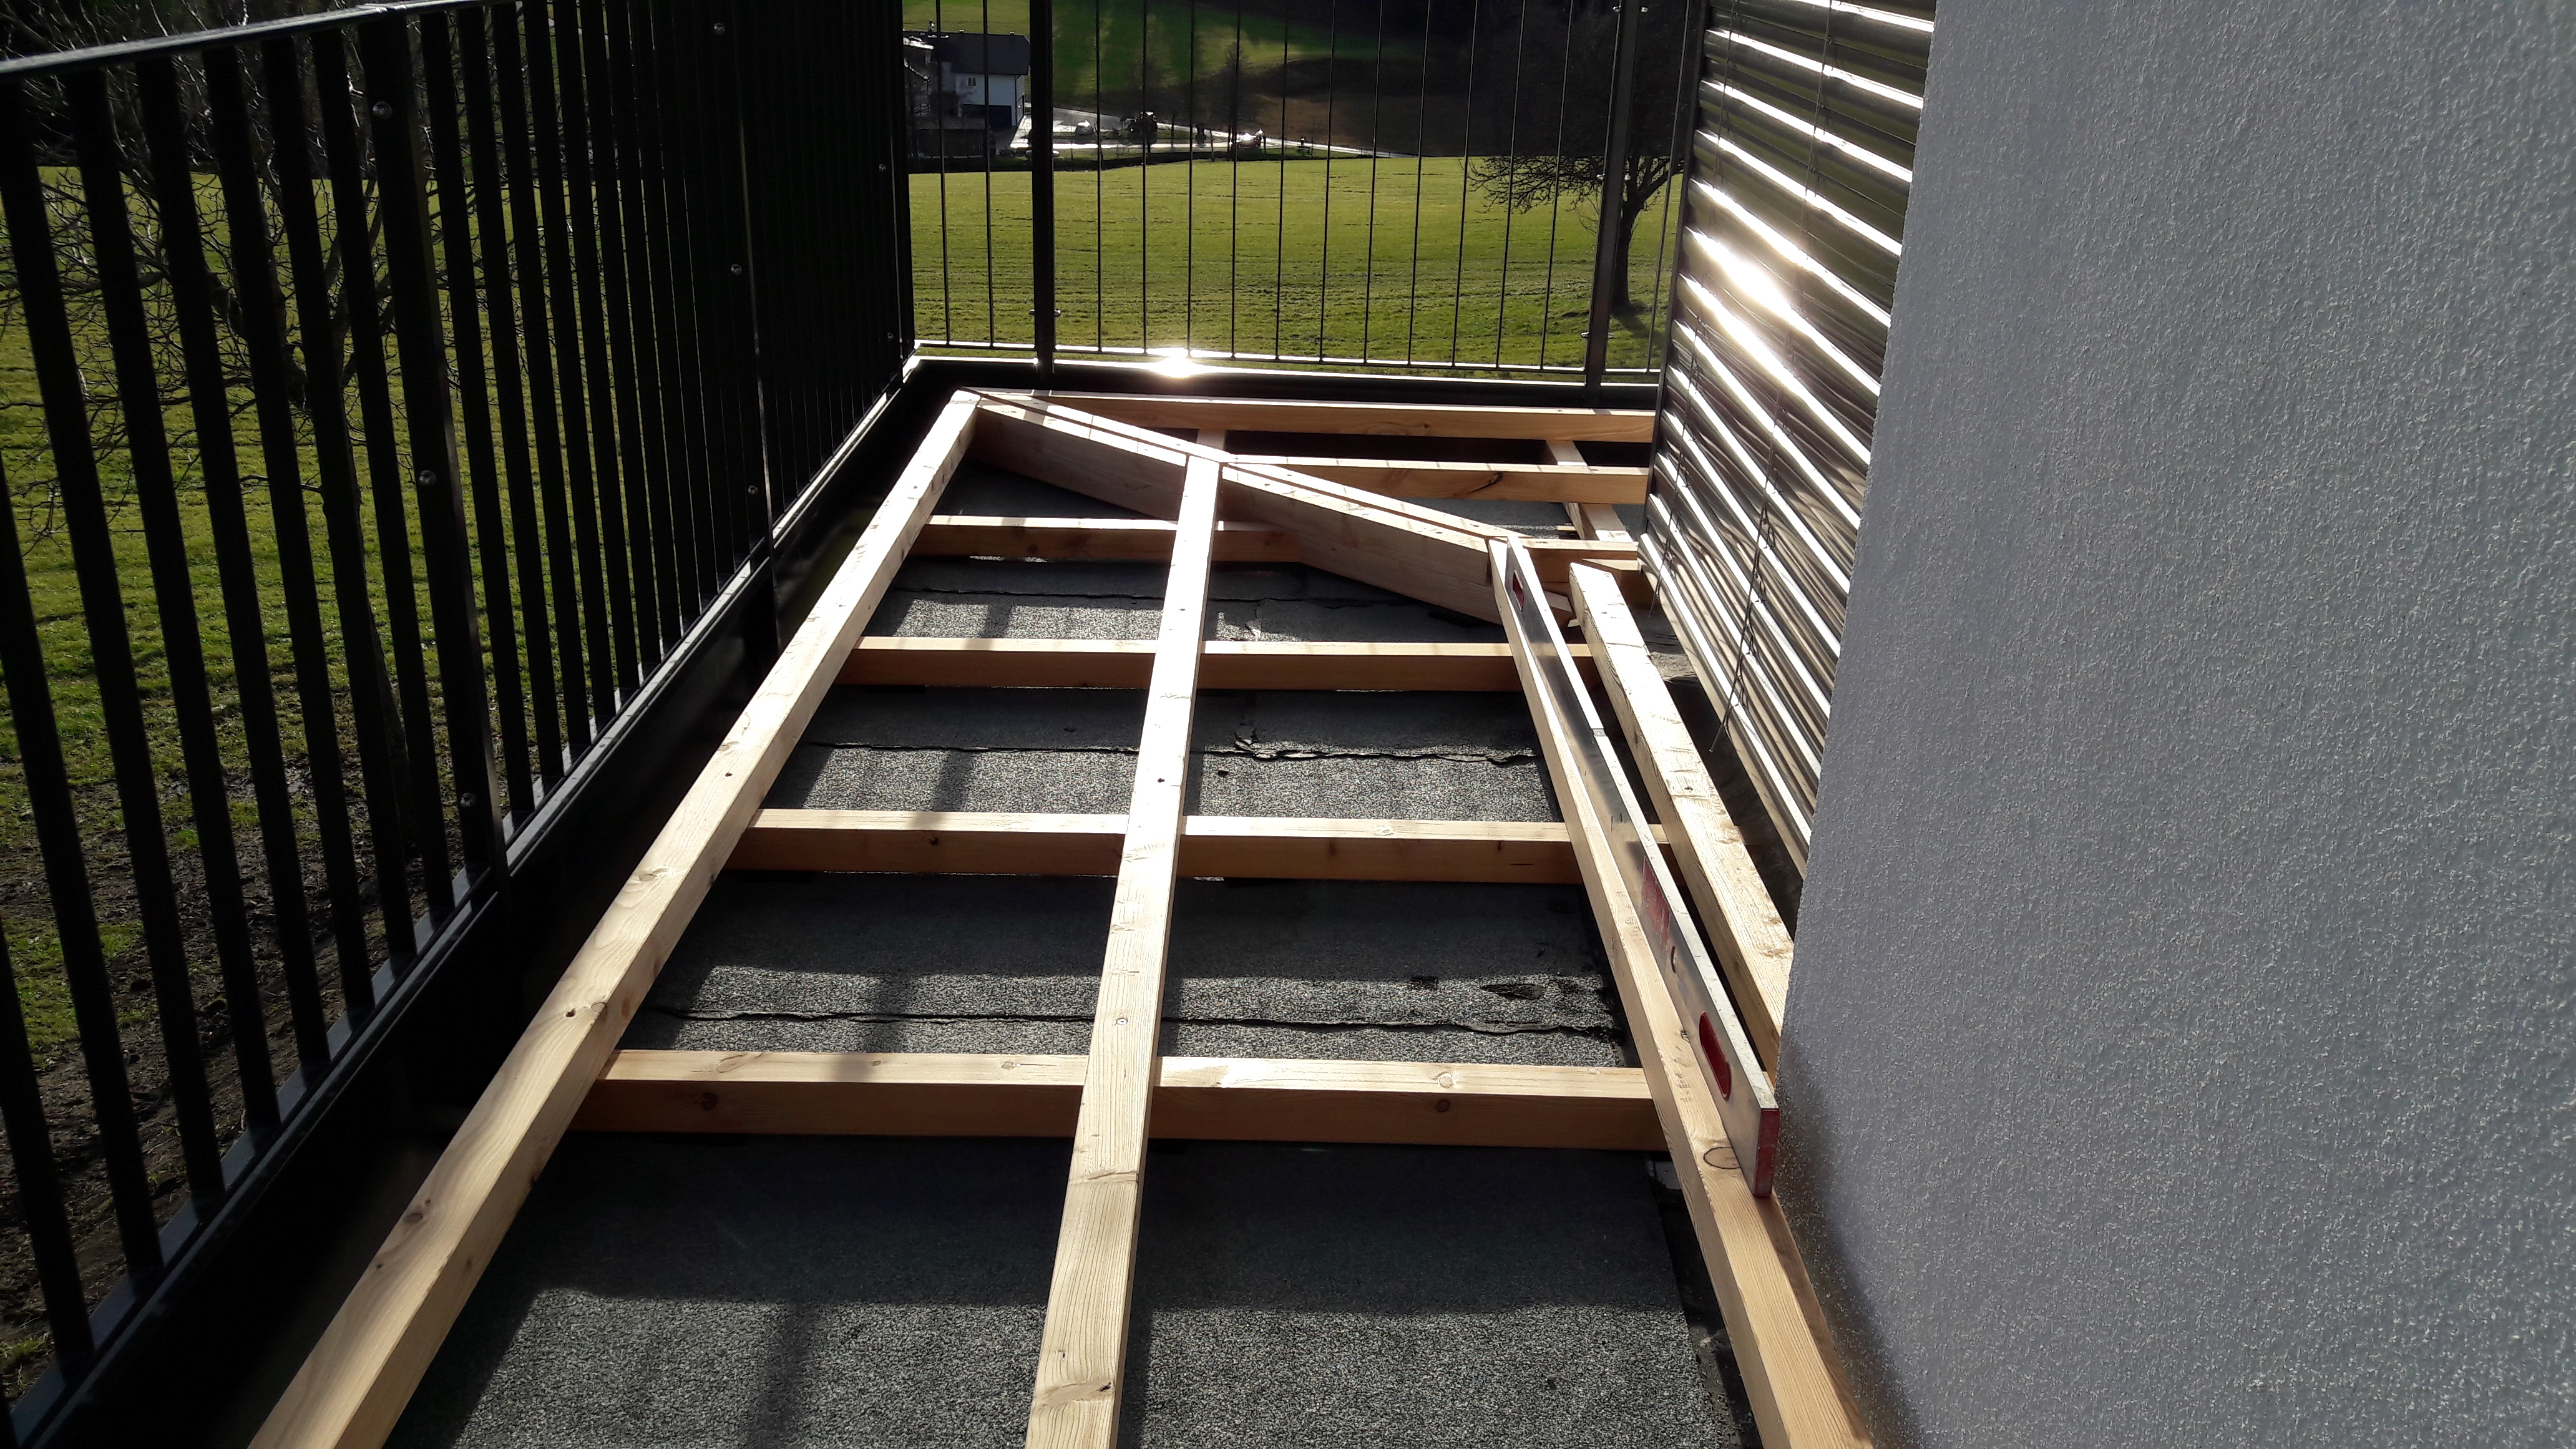 Terrasse Lärche Unterkonstruktion